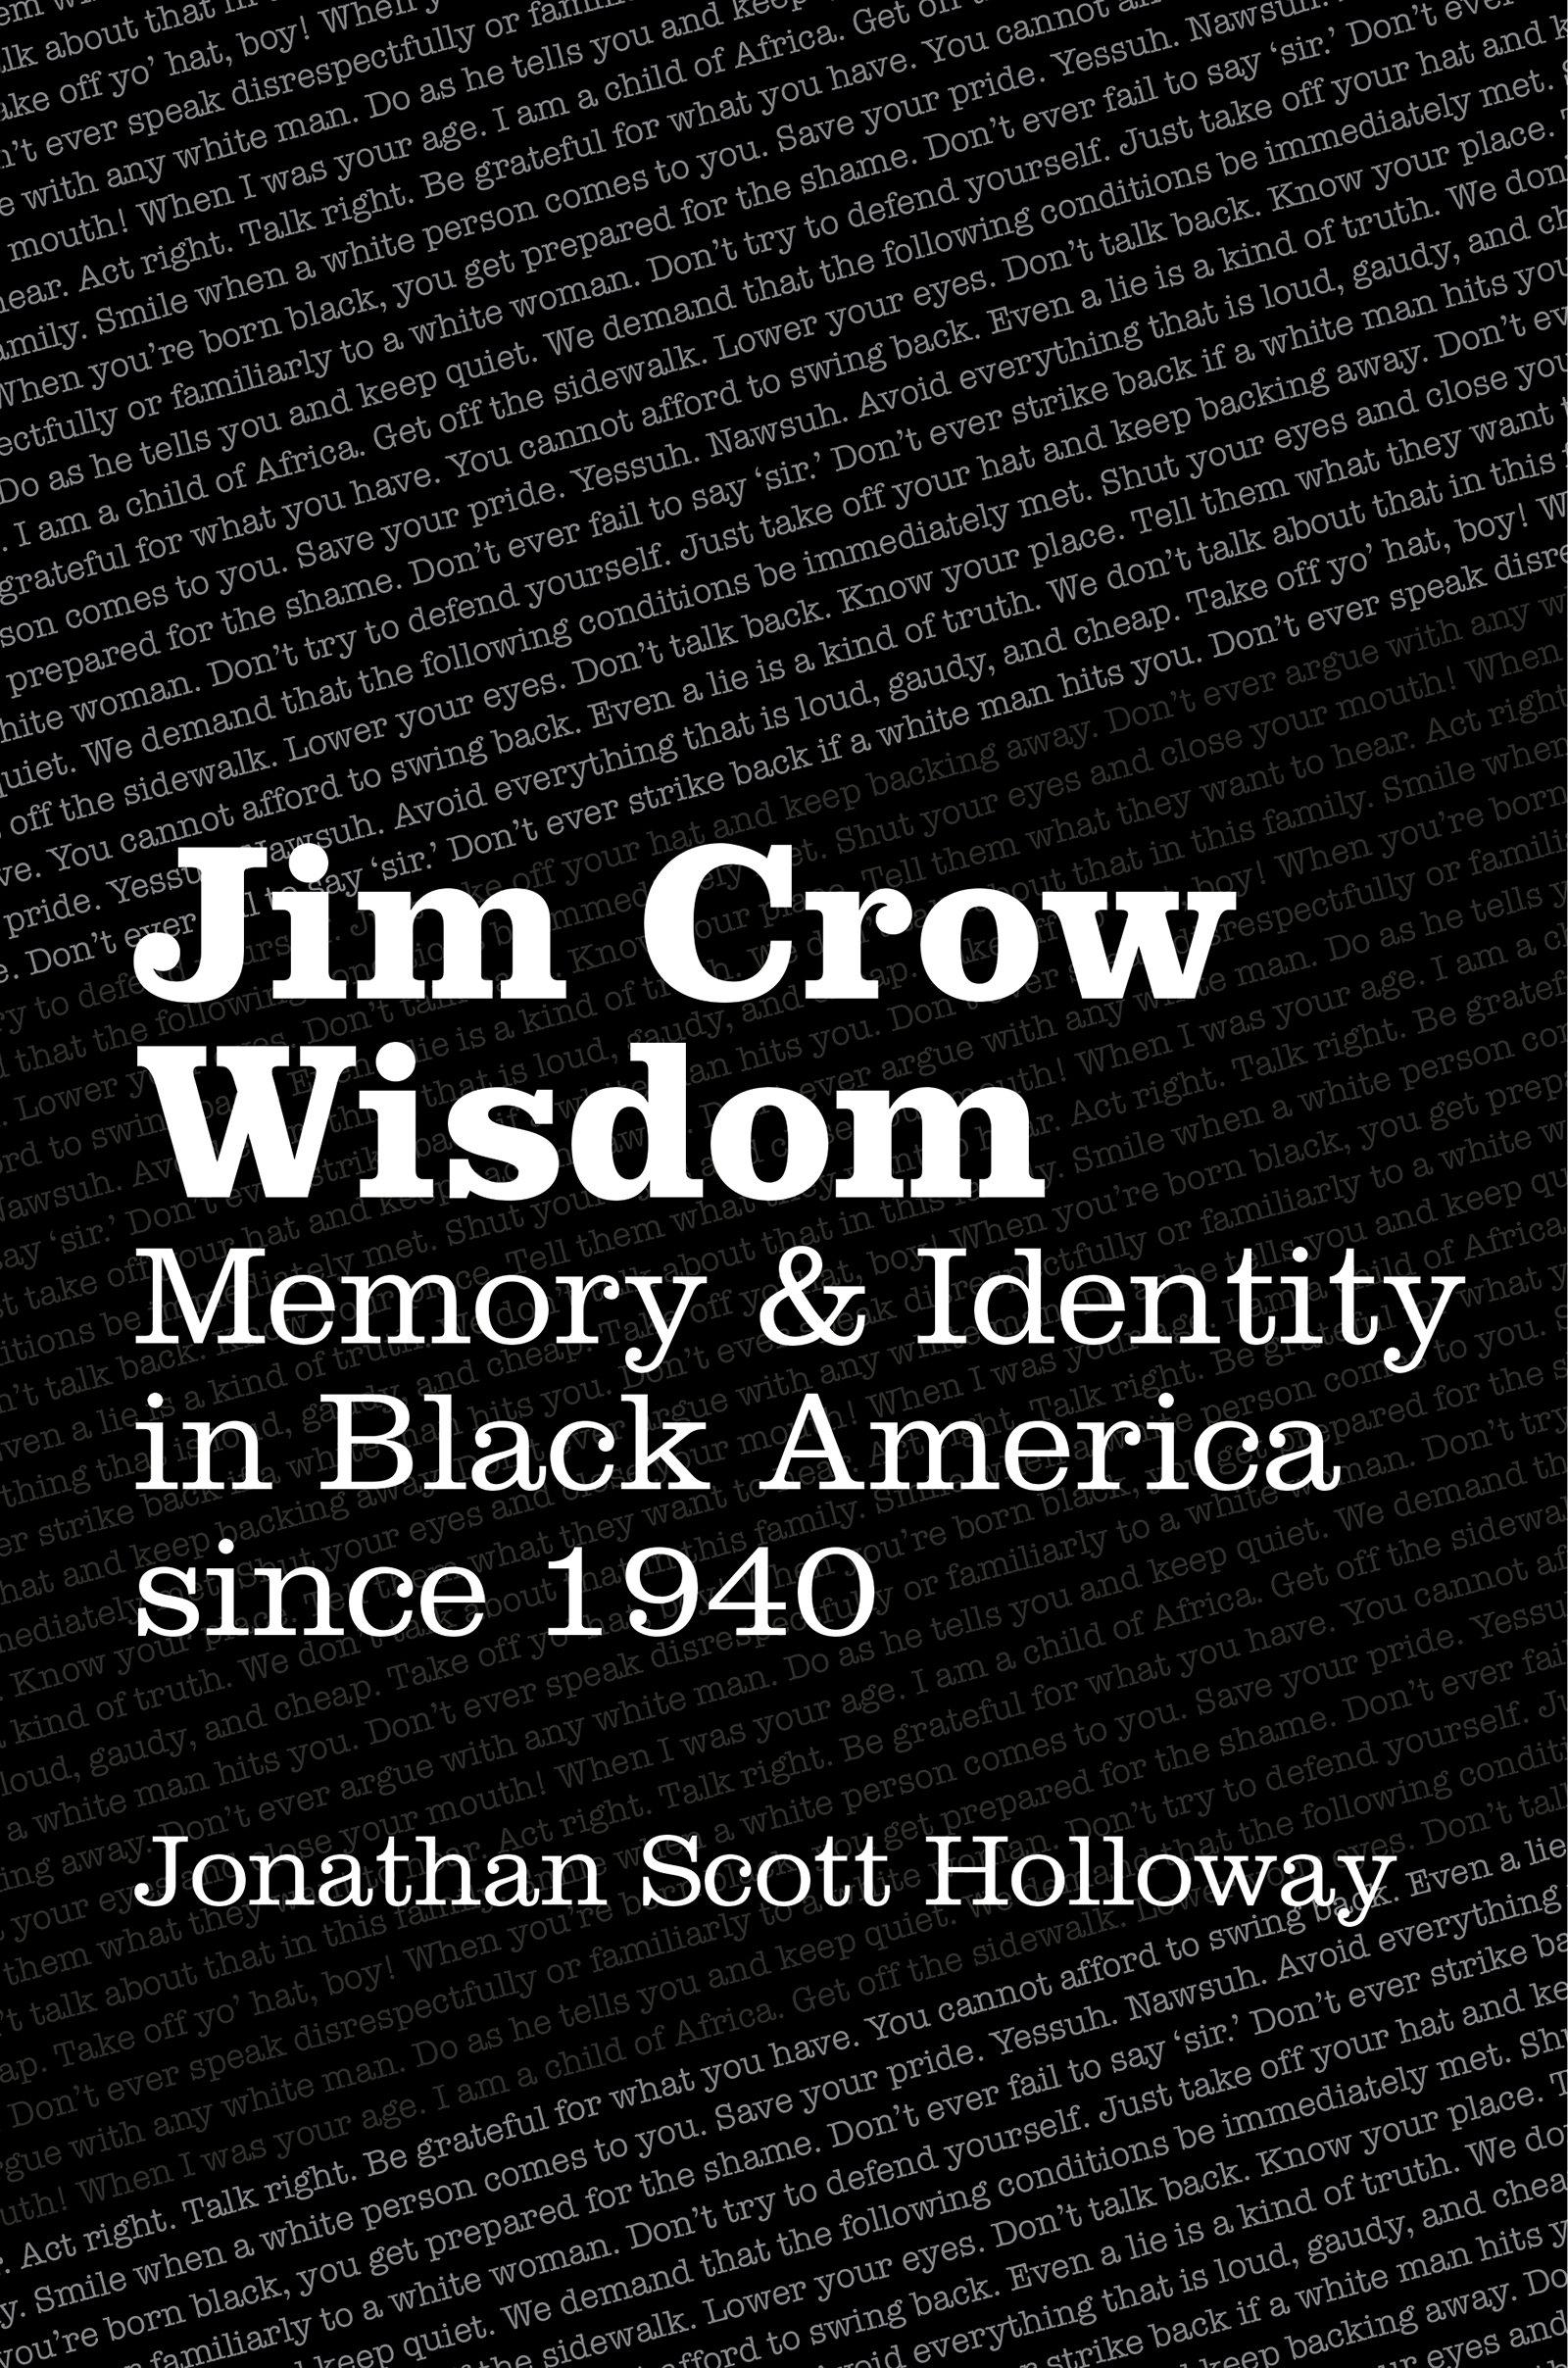 Jim crow wisdom memory and identity in black america since 1940 jim crow wisdom memory and identity in black america since 1940 jonathan scott holloway 9781469626413 amazon books fandeluxe Gallery